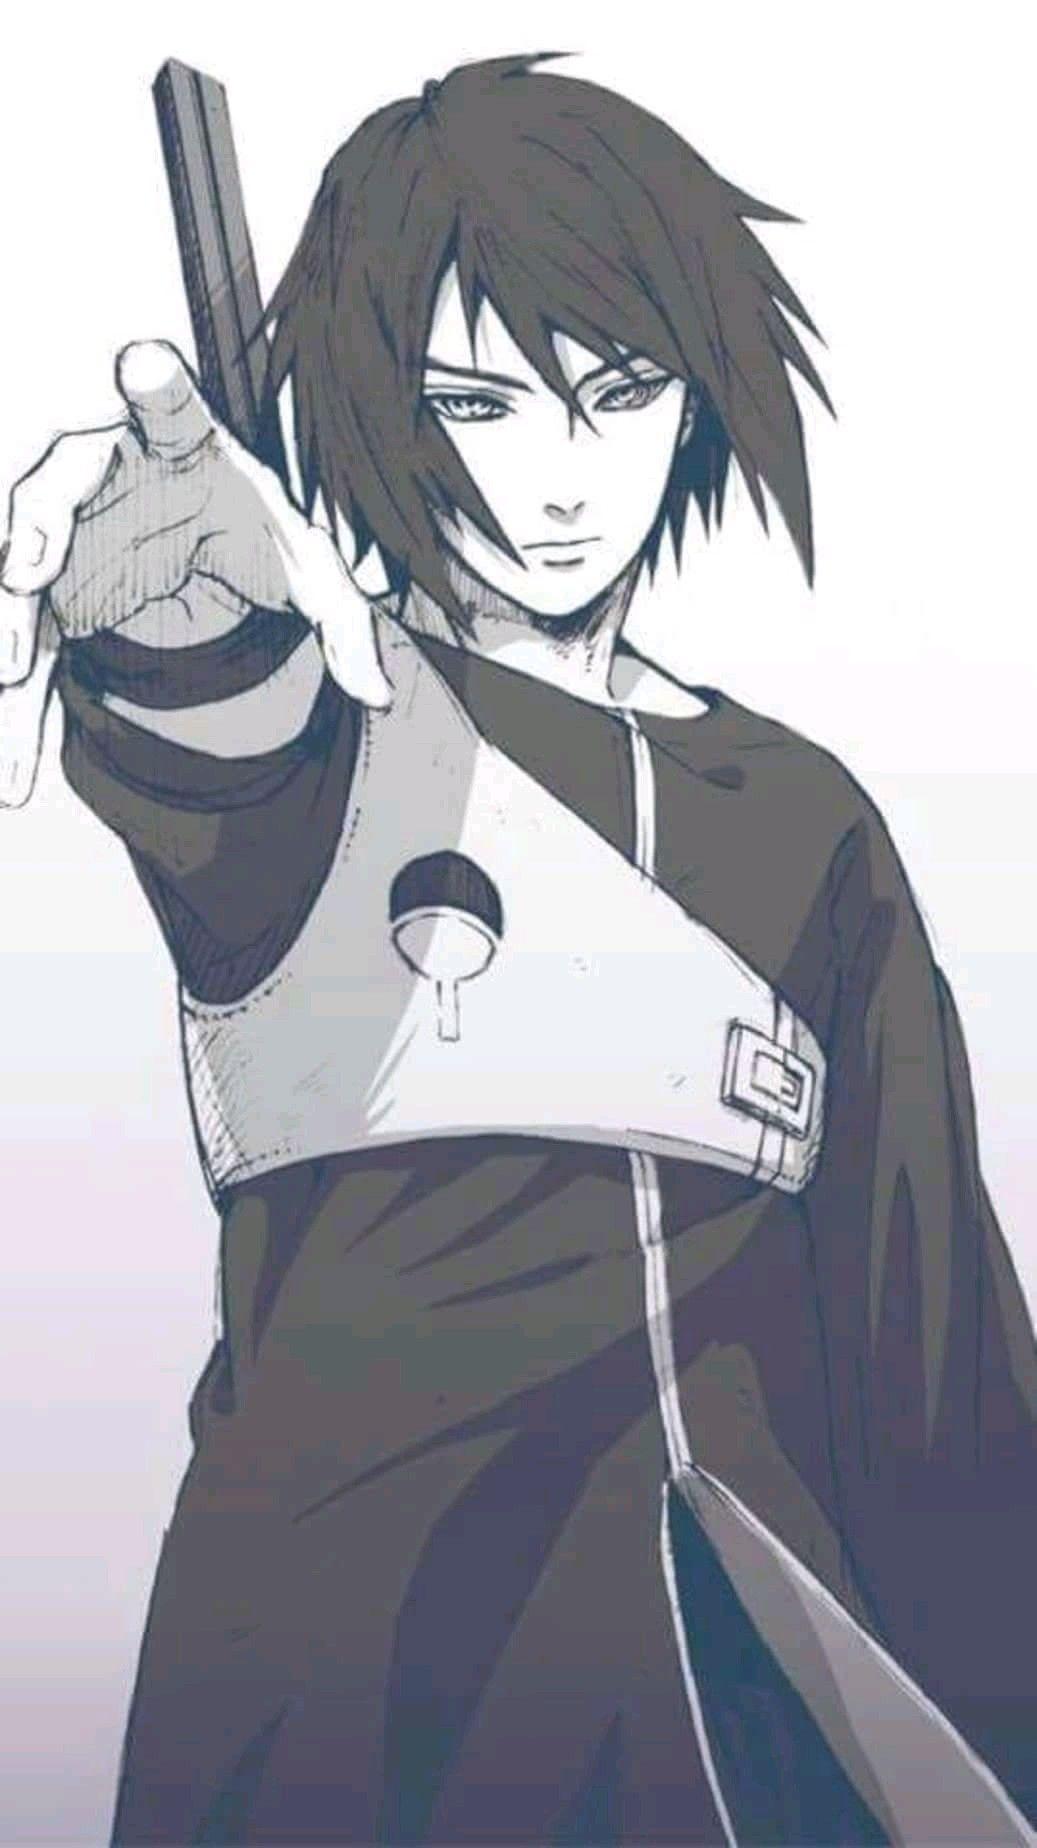 Wallpaper. Naruto, Disegni, Anime